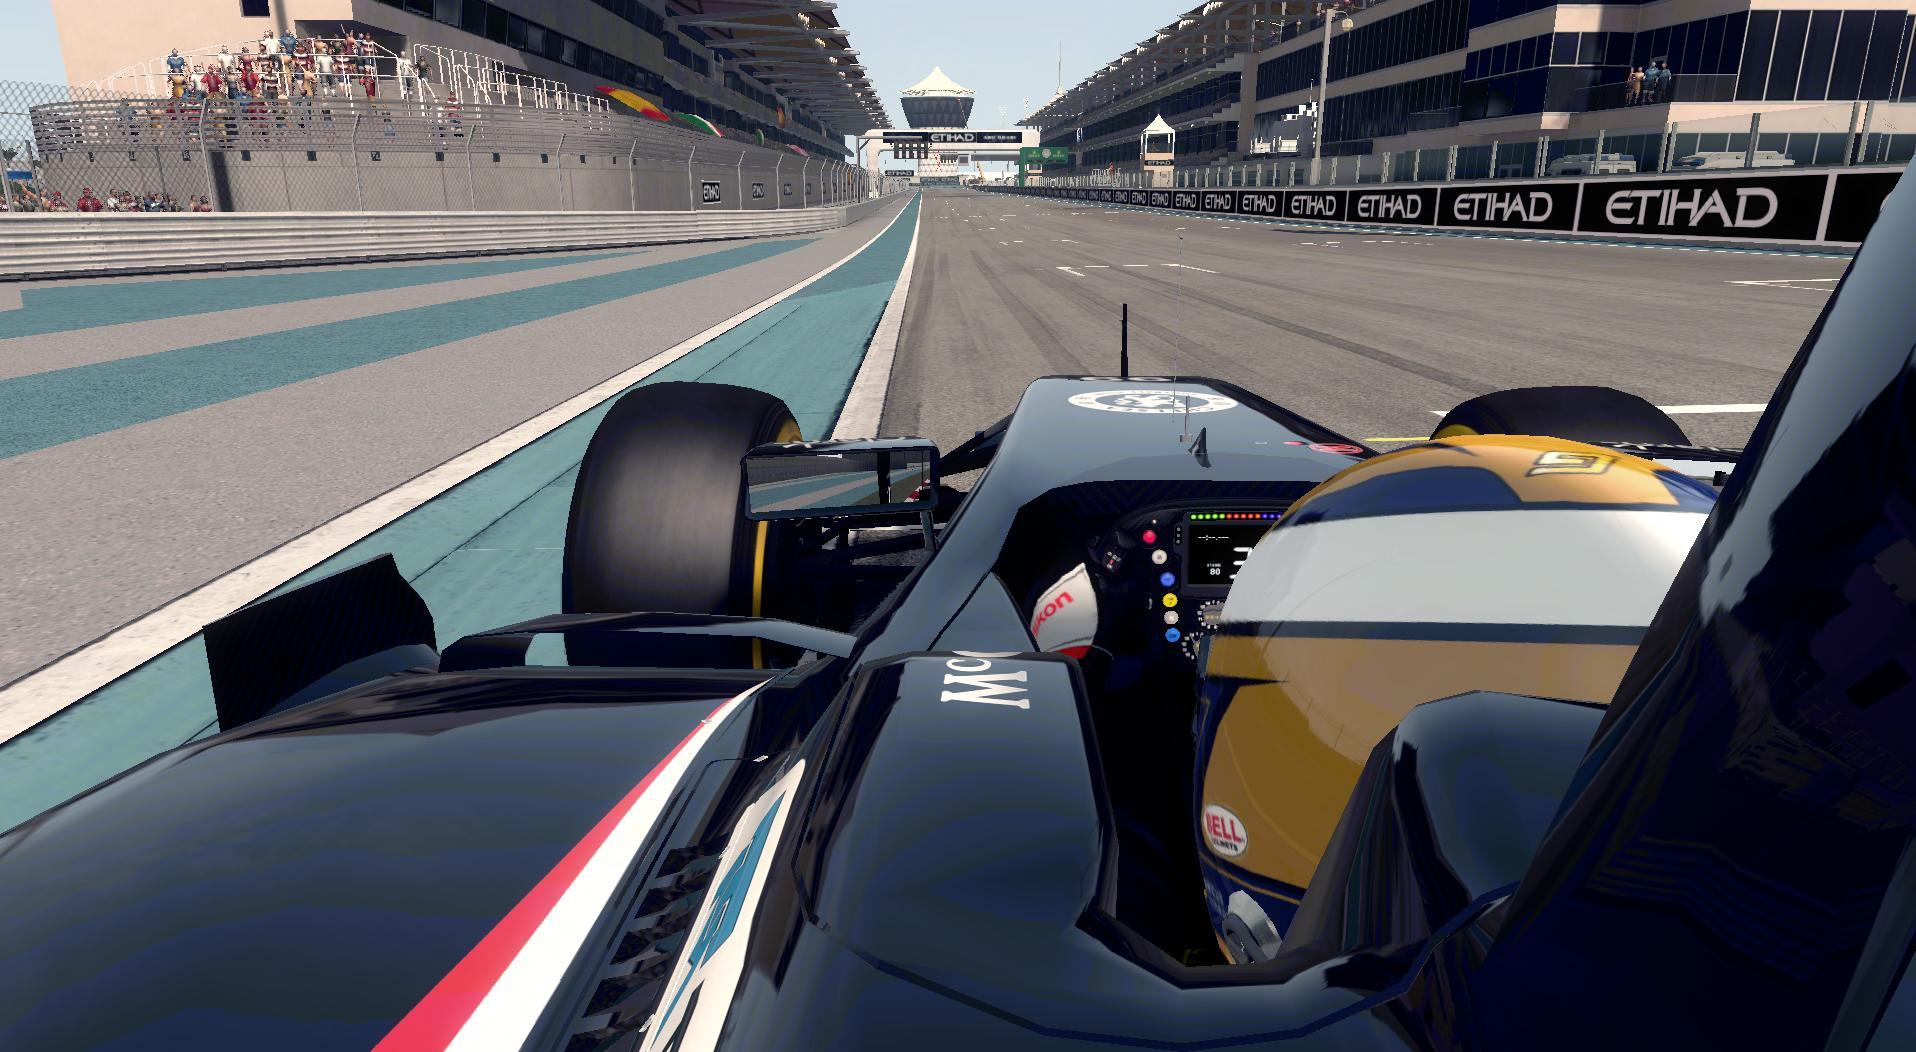 F1 2014 Marcus Ericsson Sauber Helmet v1.1